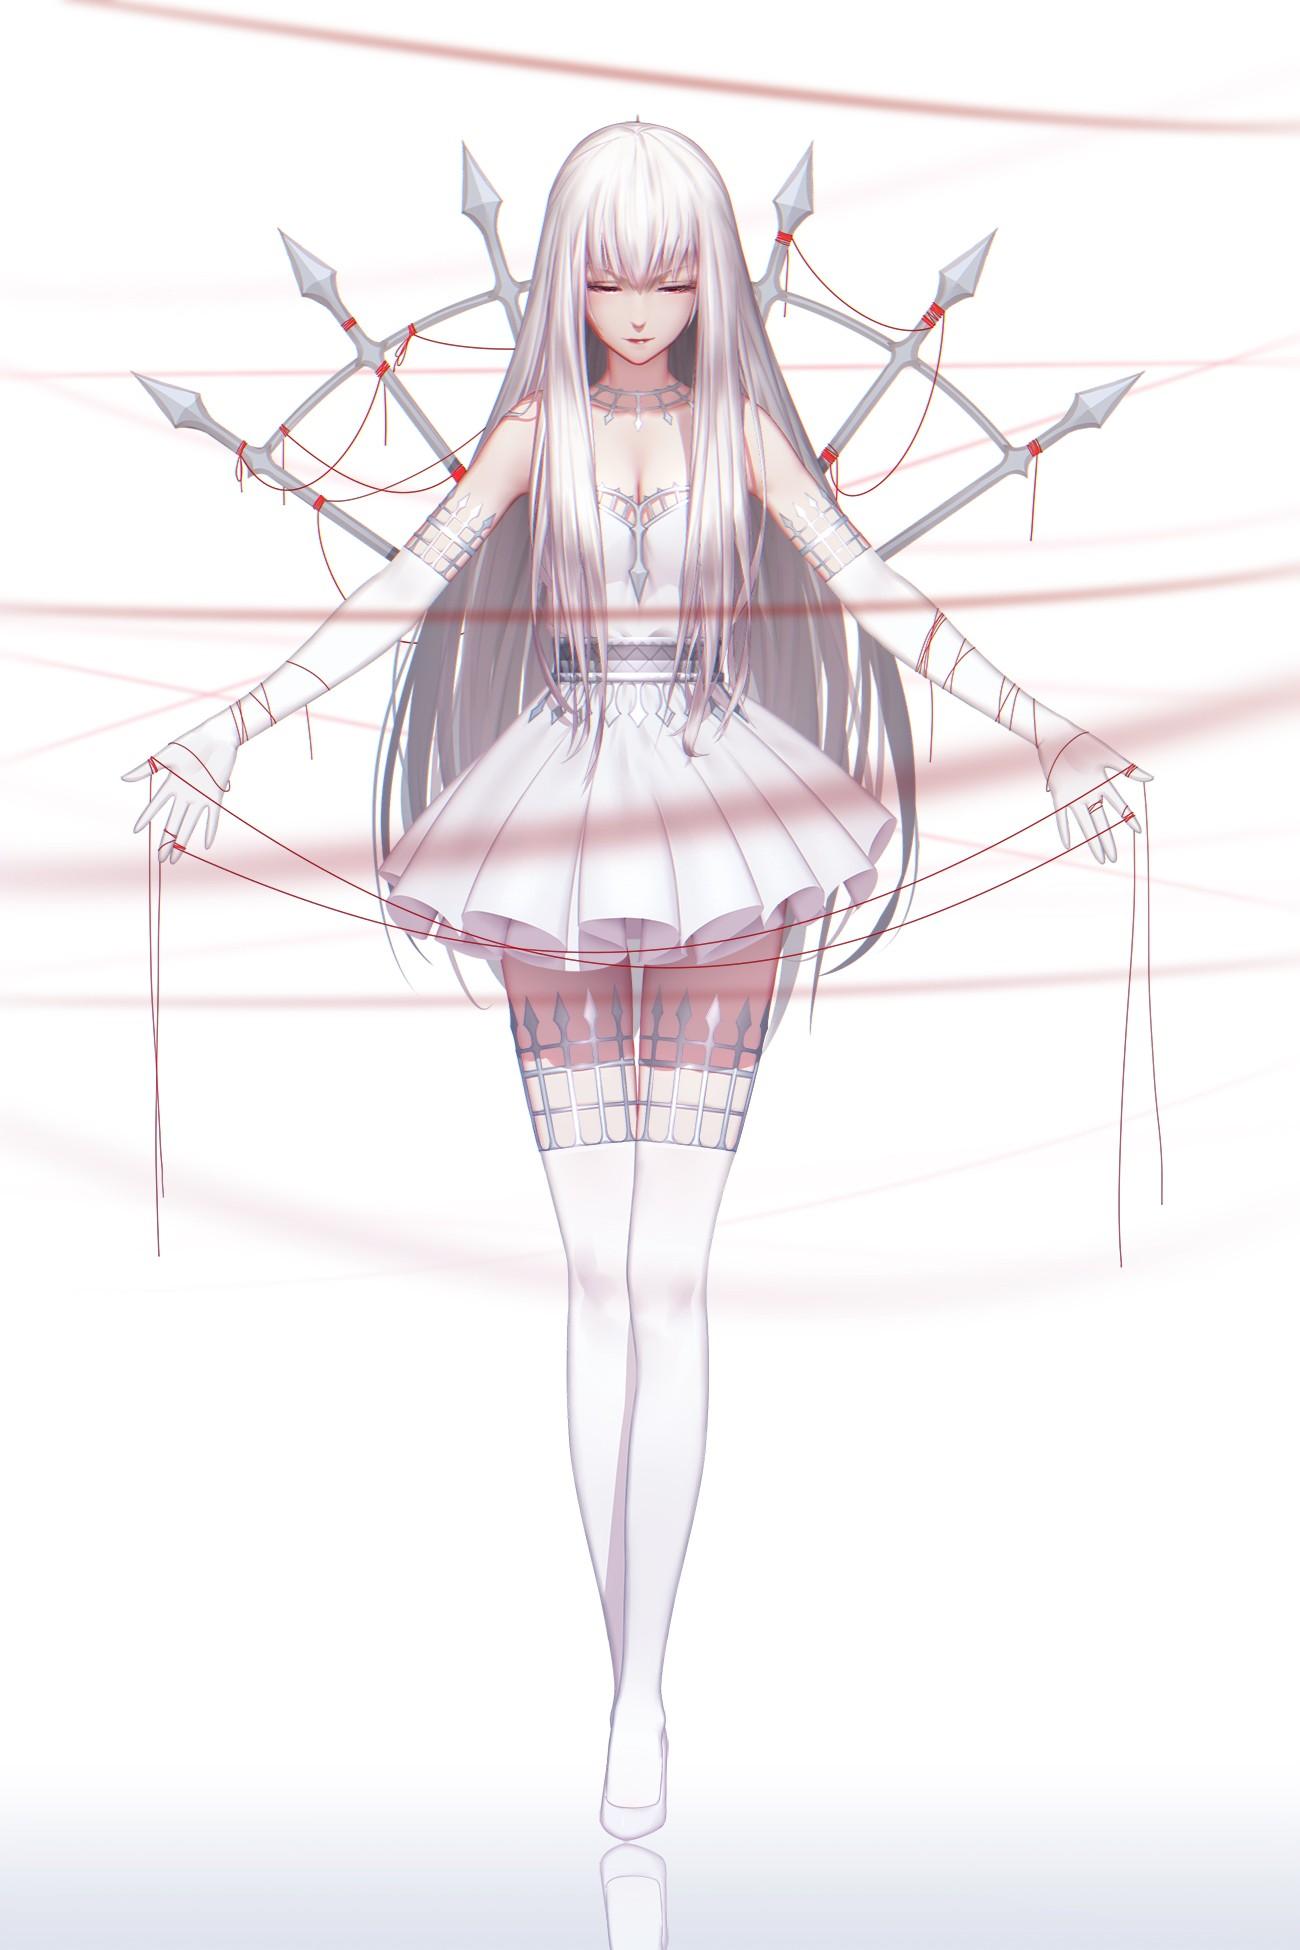 Anime 1300x1950 Pixiv Fantasia T original characters long hair white hair red eyes gloves thread thigh-highs white dress white background anime girls anime